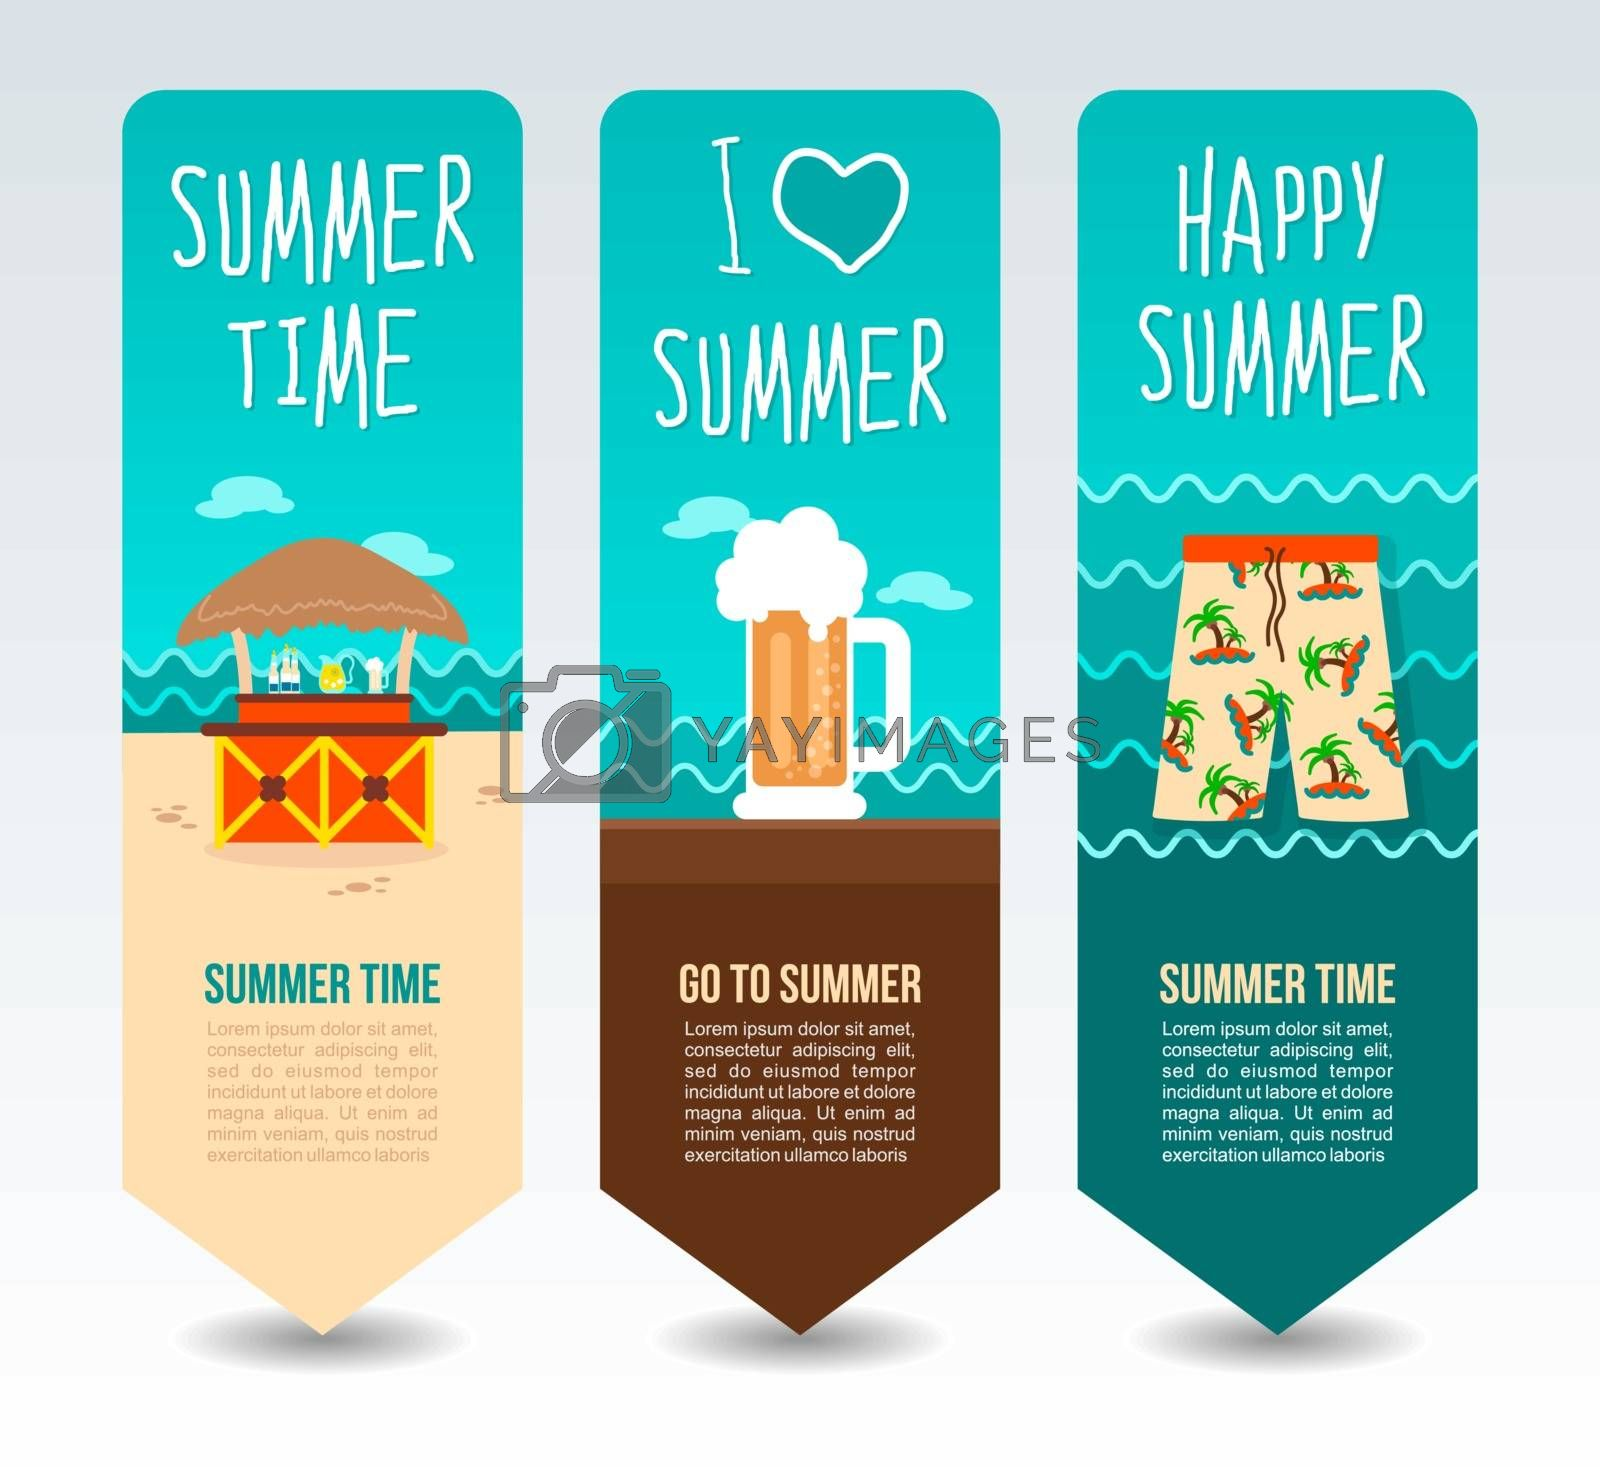 Tropical bar bungalow, beach shorts and beer mug. Summer Travel and vacation vector banners. Summertime. Holiday